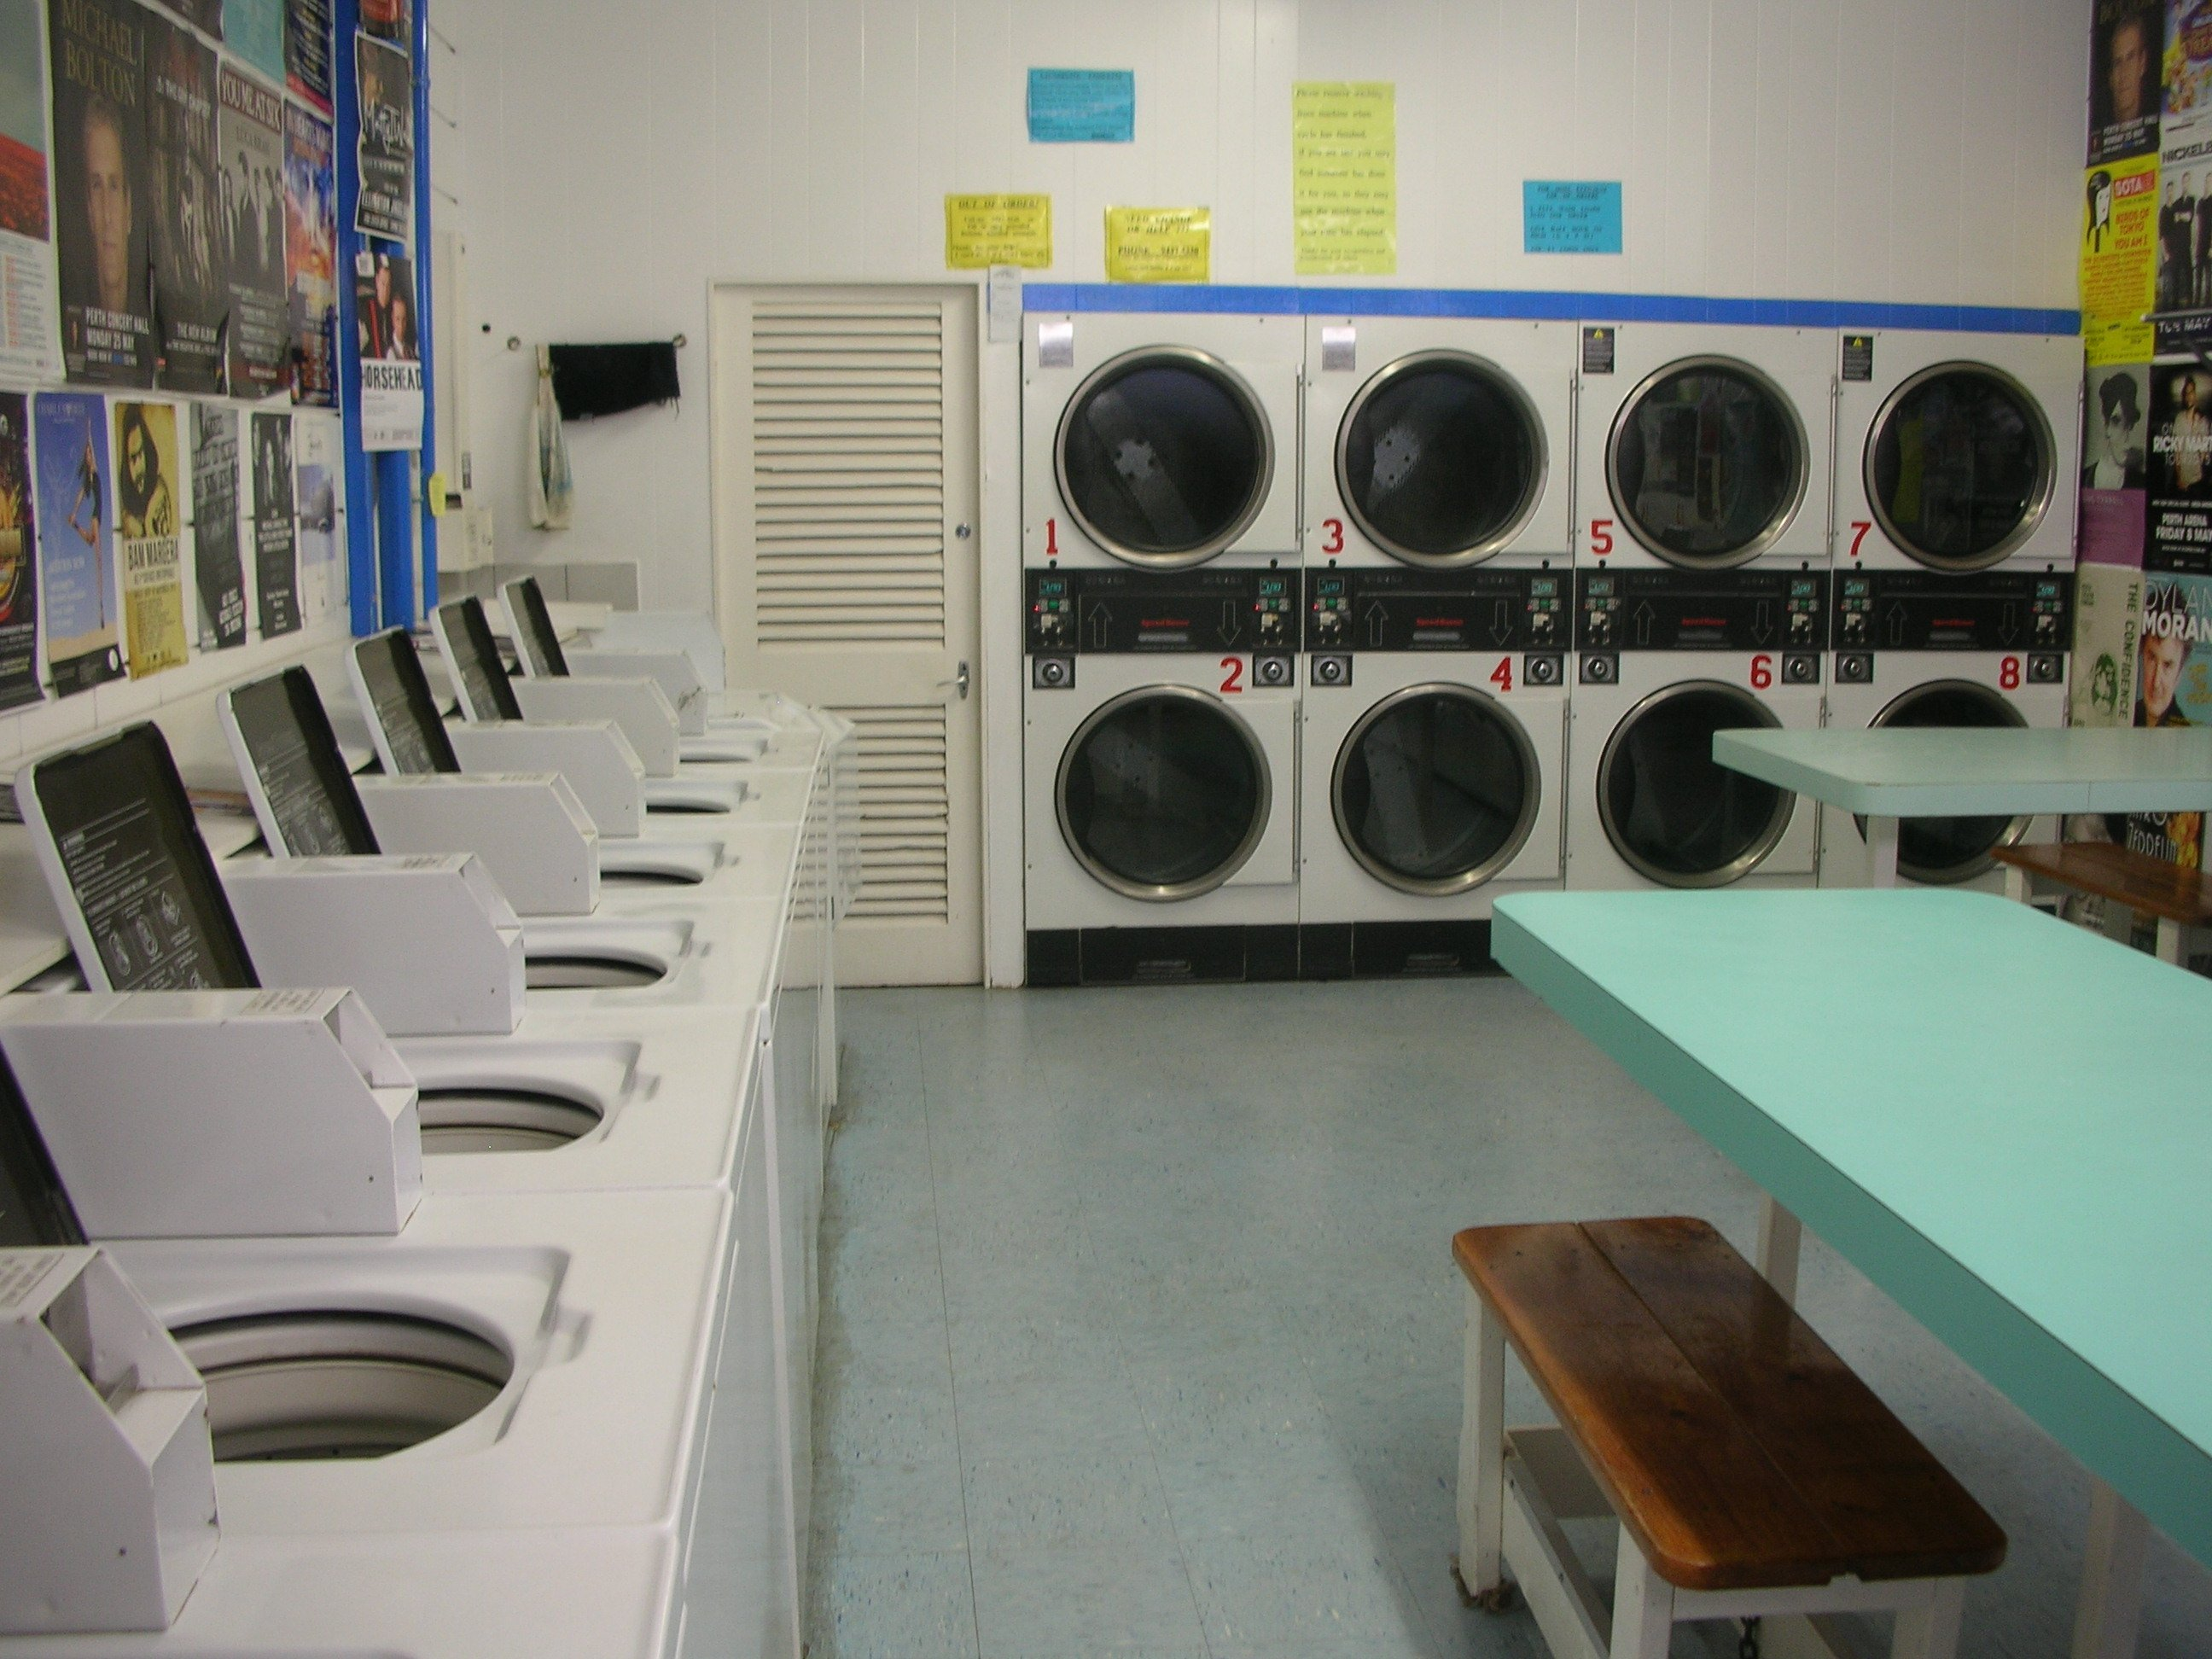 Laundrybiz laundromat perth